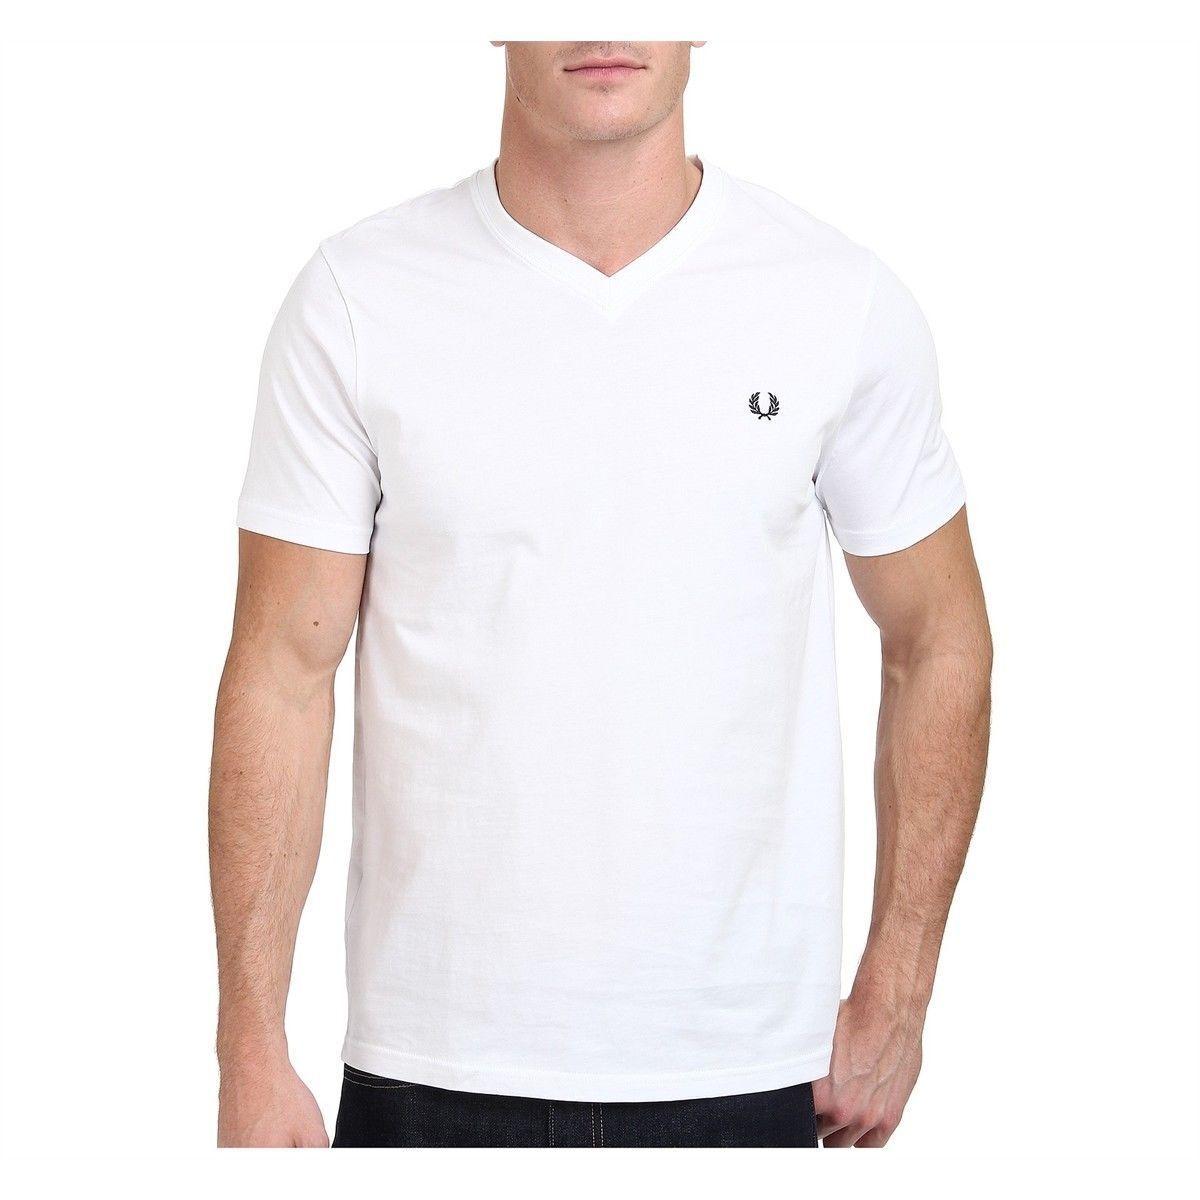 Fred PERRY T SHIRT V NECK T-shirt scollo V t shirt a maniche corte